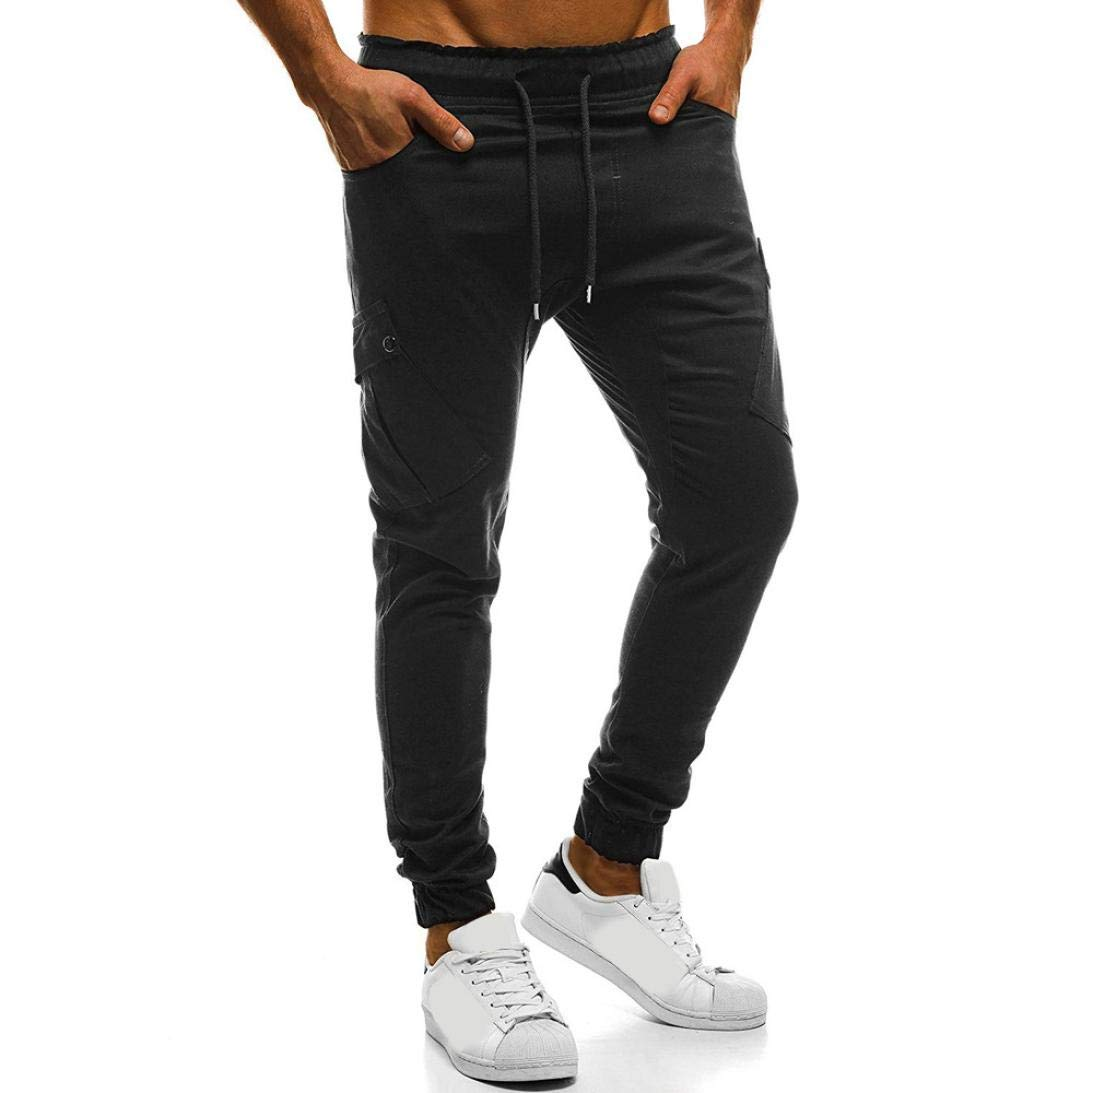 Realdo Fashion Sport Pure Color Bandage Casual Sweatpants Drawstring Cargo Pant Best Trousers Seller(X-Large,Black)